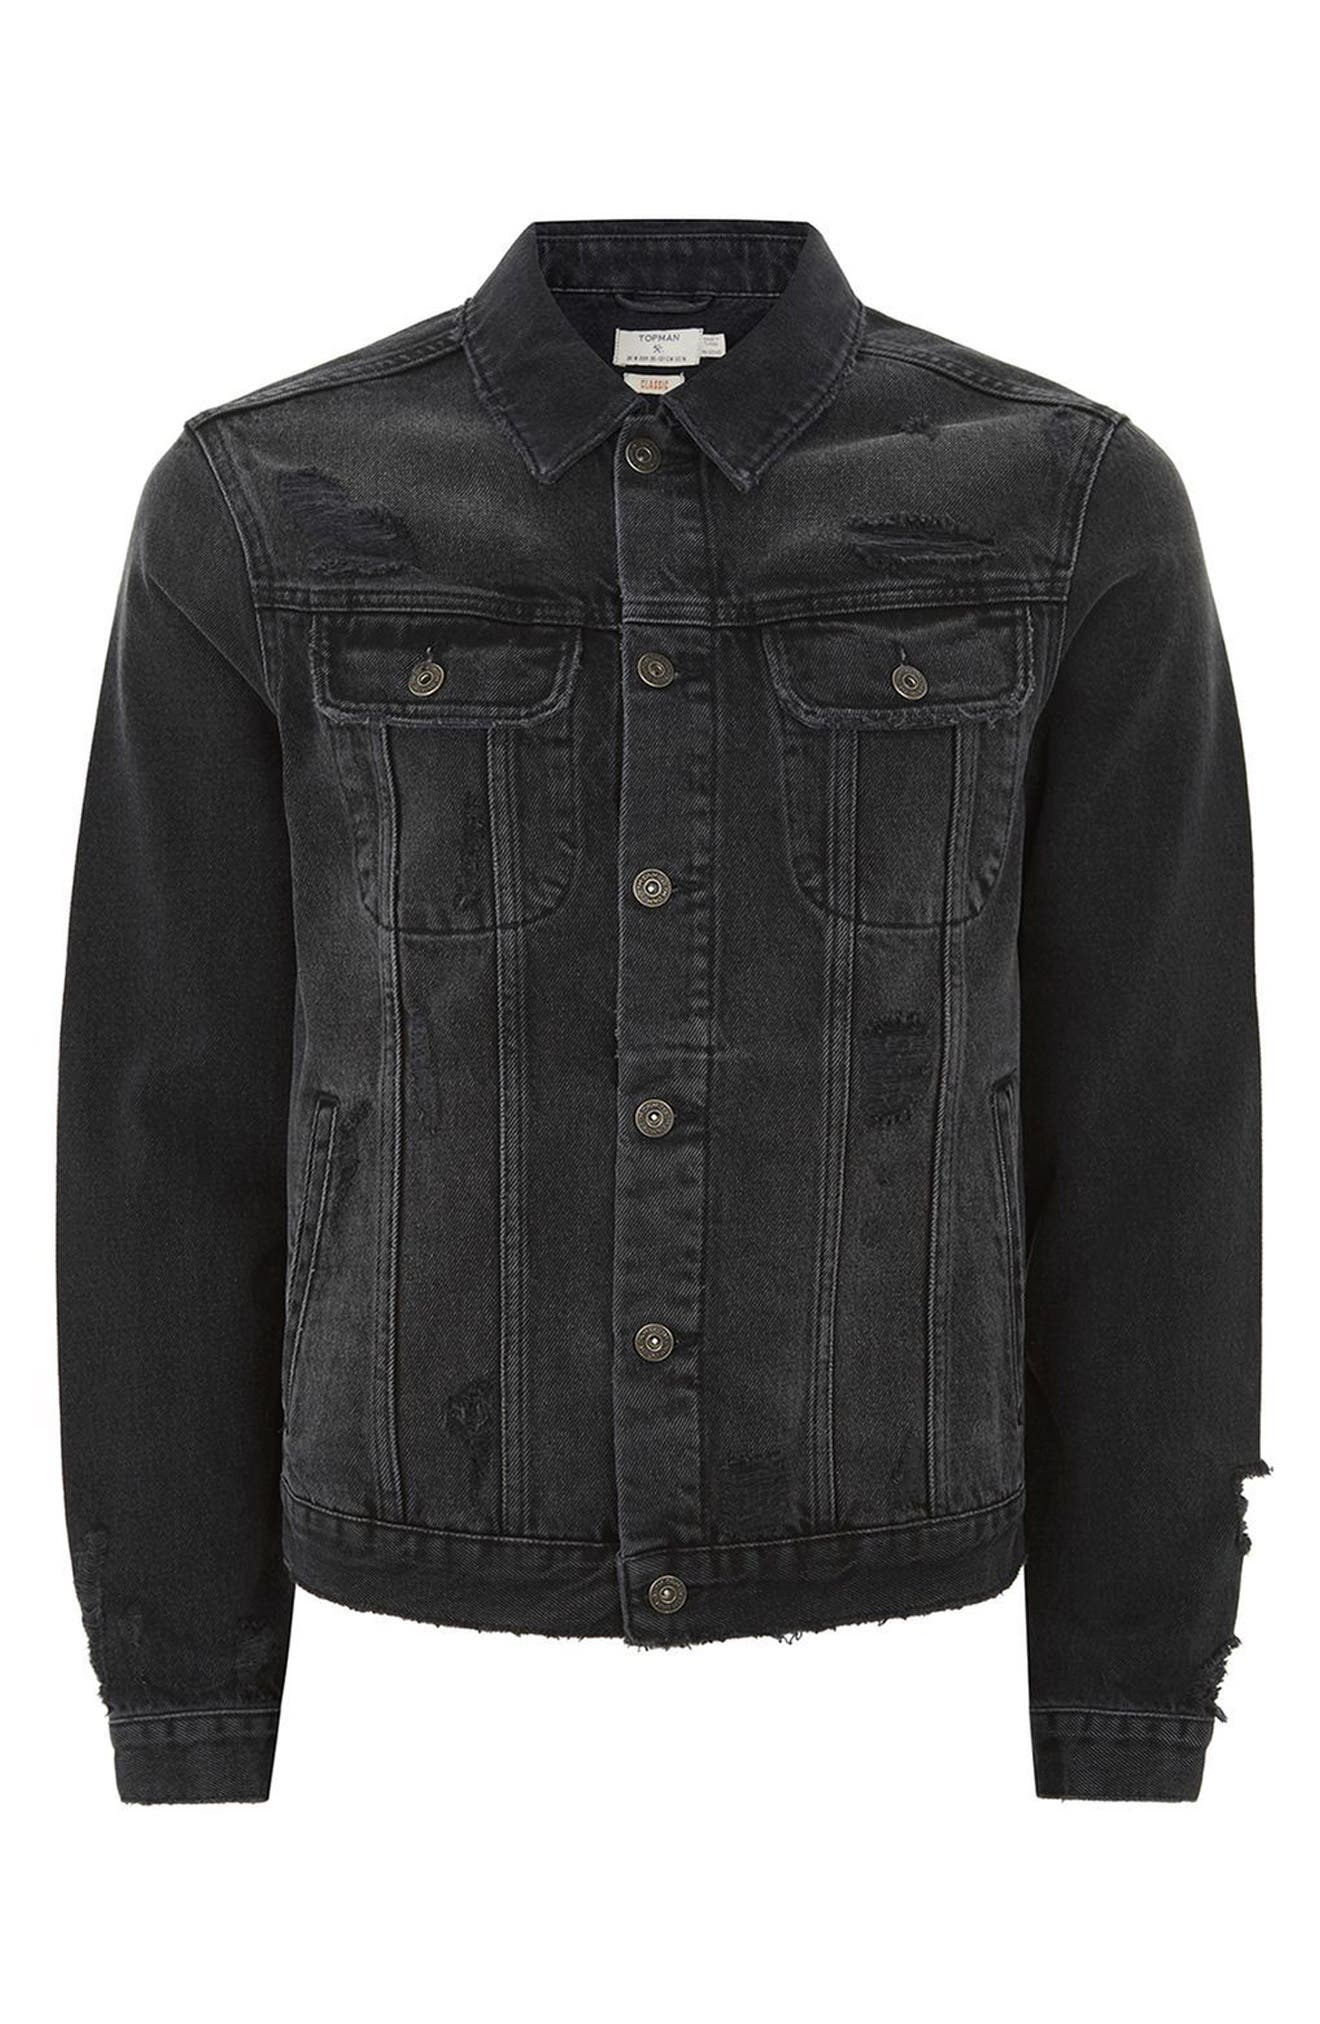 Piro Distressed Denim Jacket,                             Alternate thumbnail 4, color,